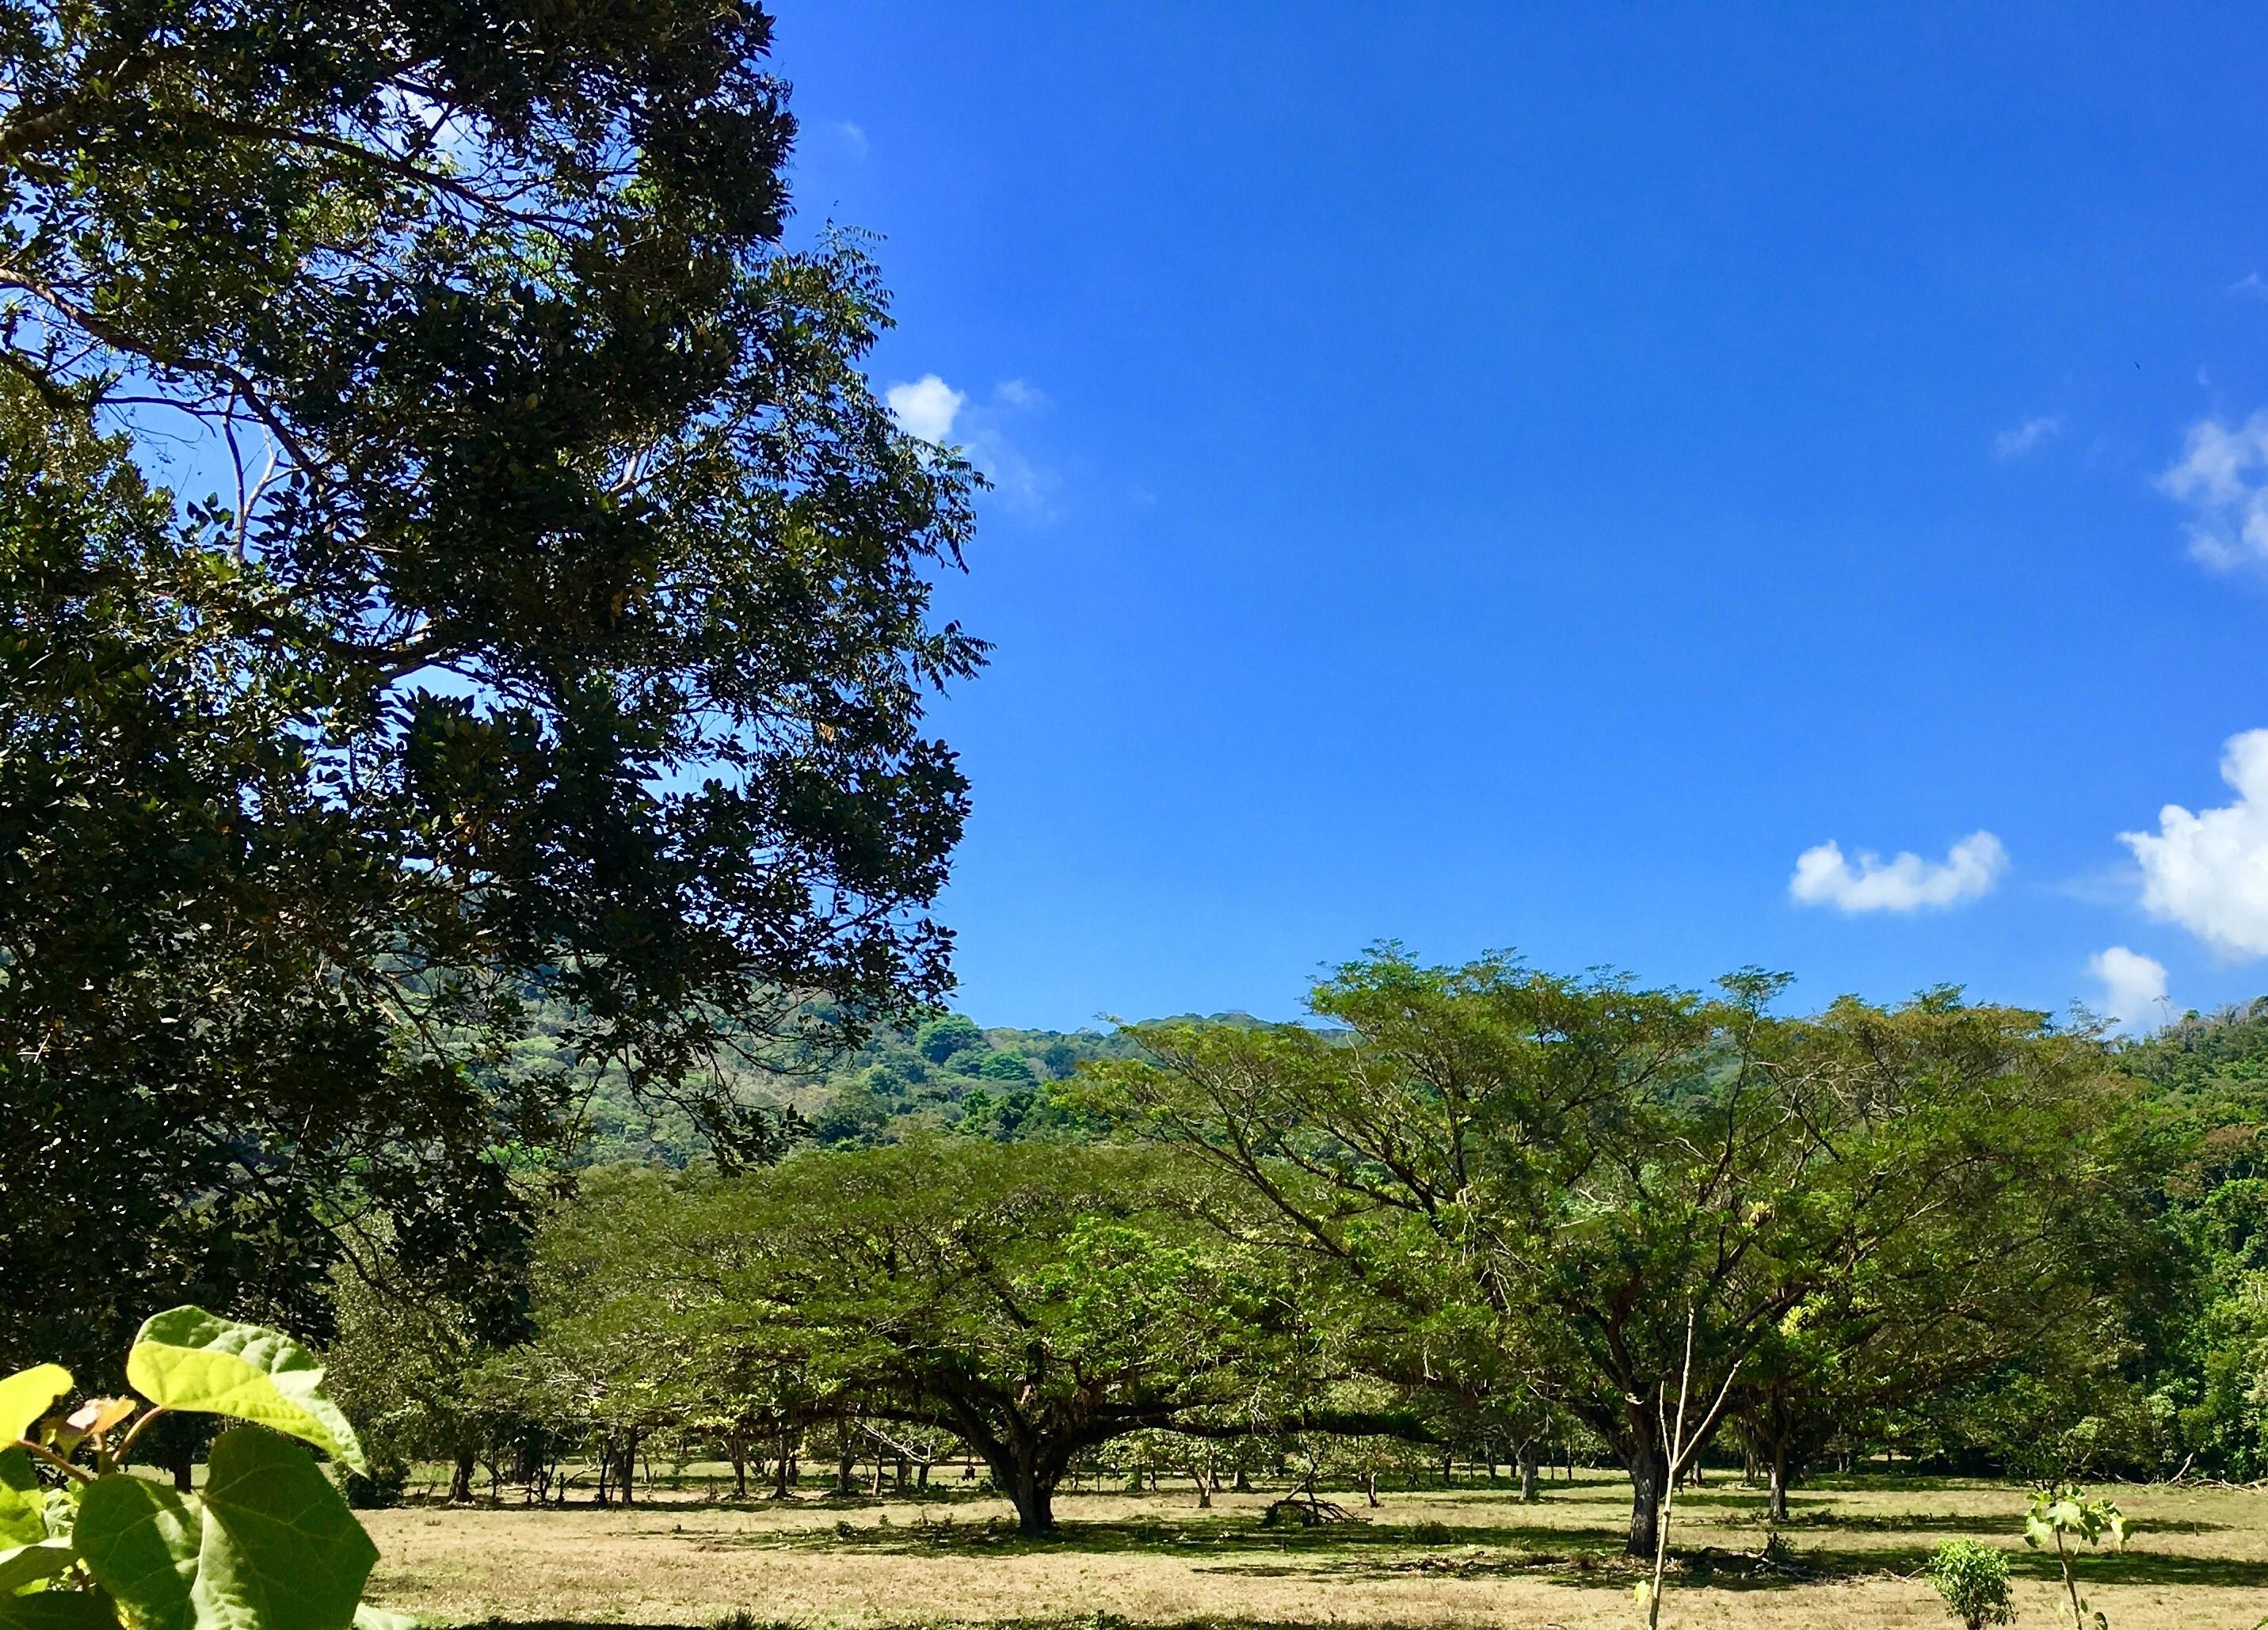 Dominical-Costa-Rica-property-costaricarealestateDOM331-1.jpg